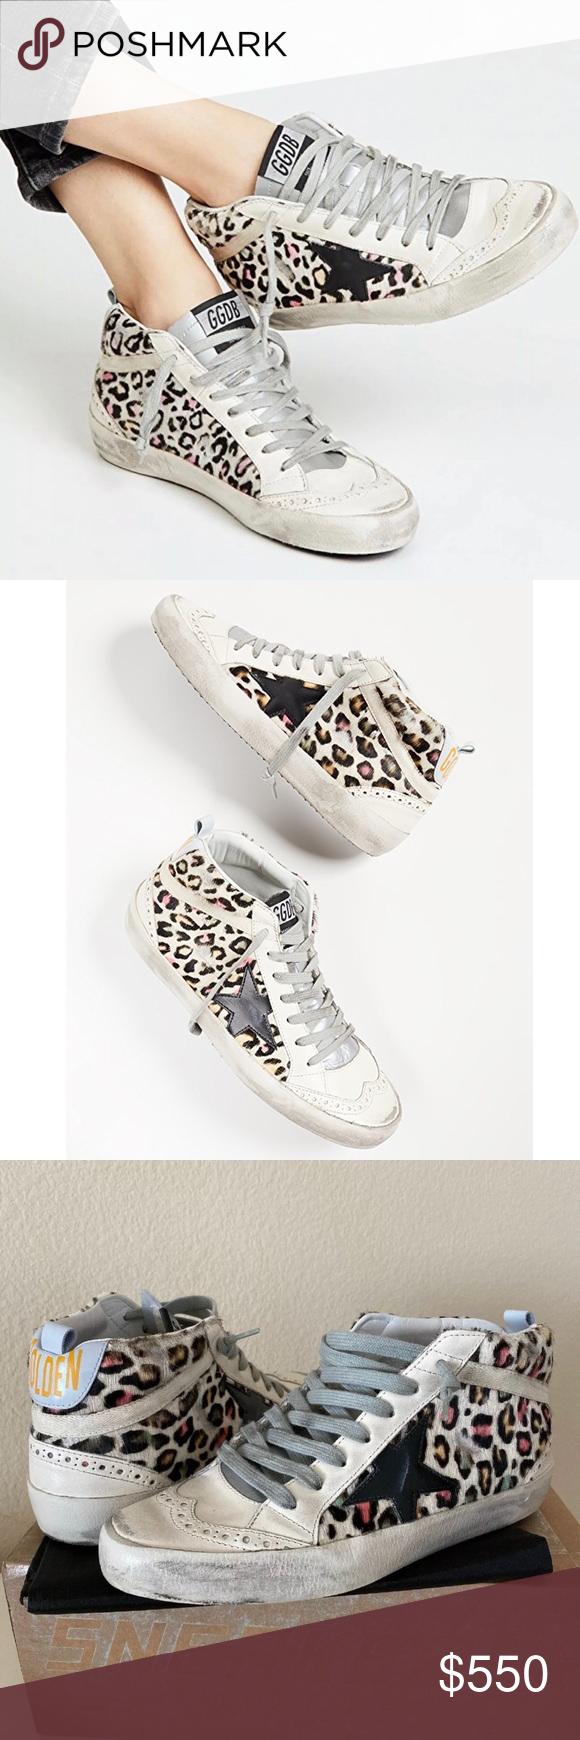 Golden Goose White Leopard Mid Star Sneakers 37 7 In 2020 Star Sneakers White Leopard Golden Goose Shoes